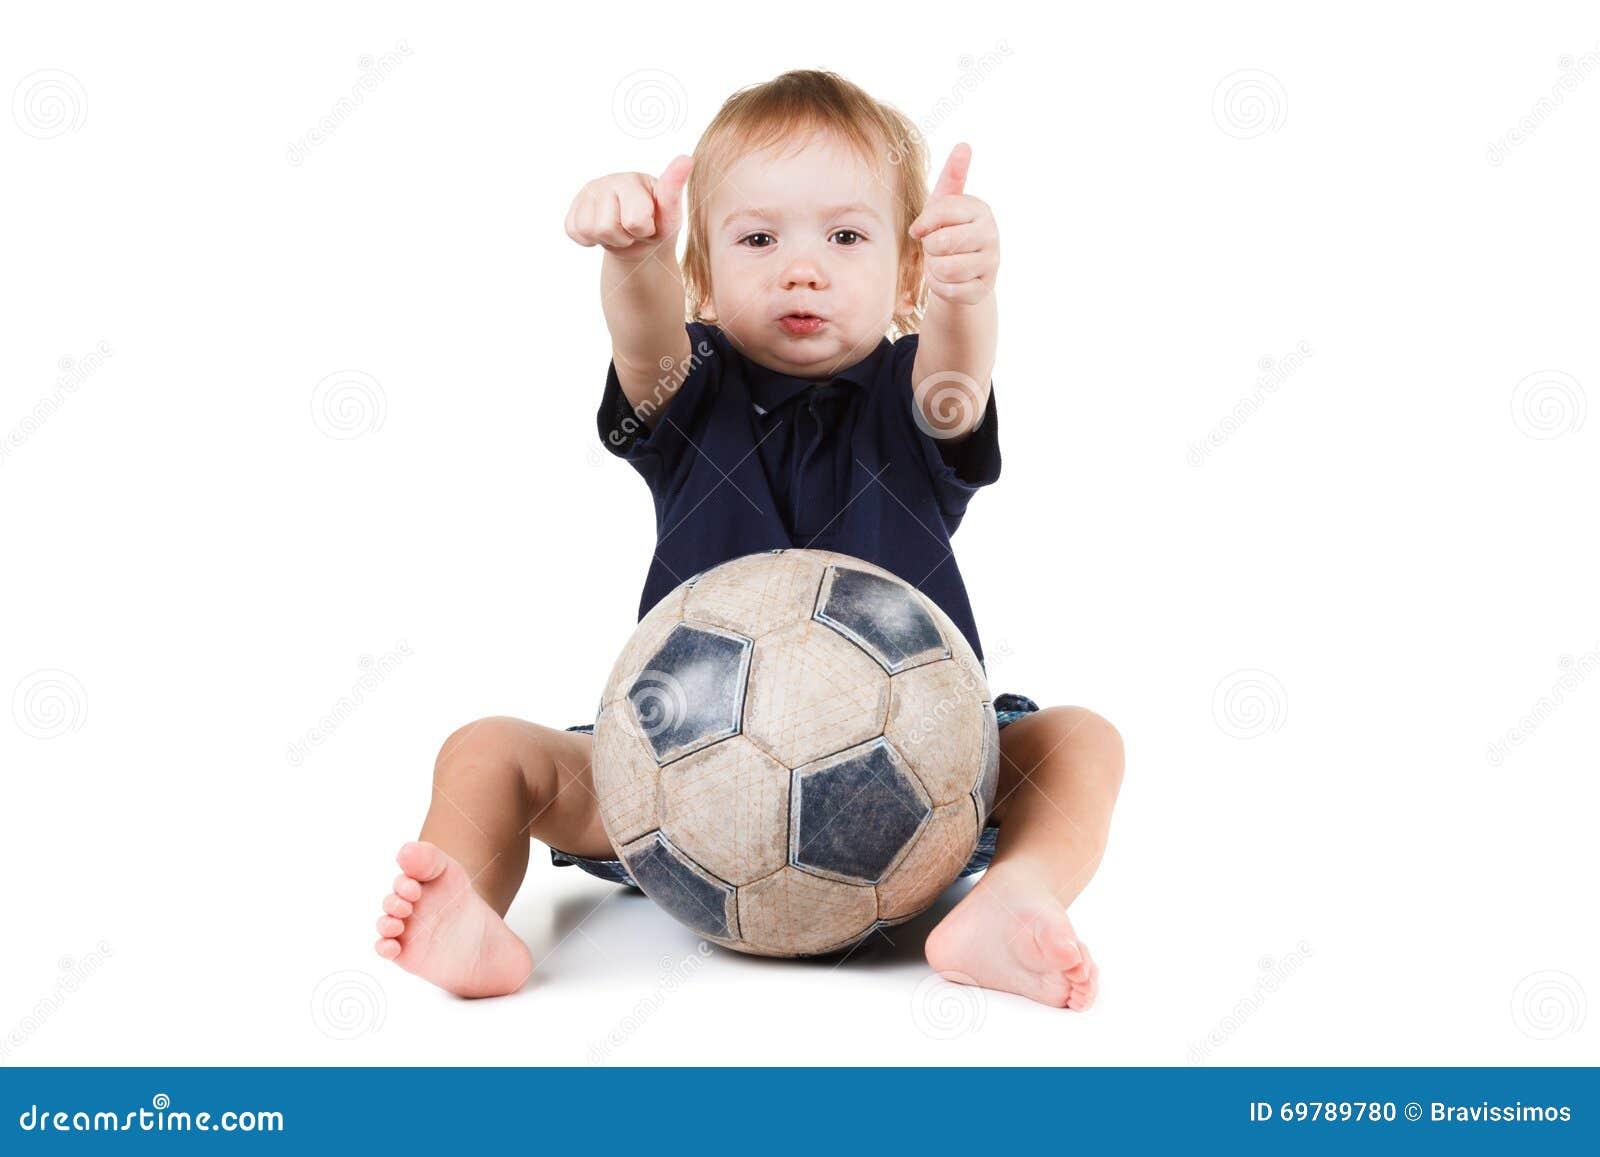 Baby soccer ball